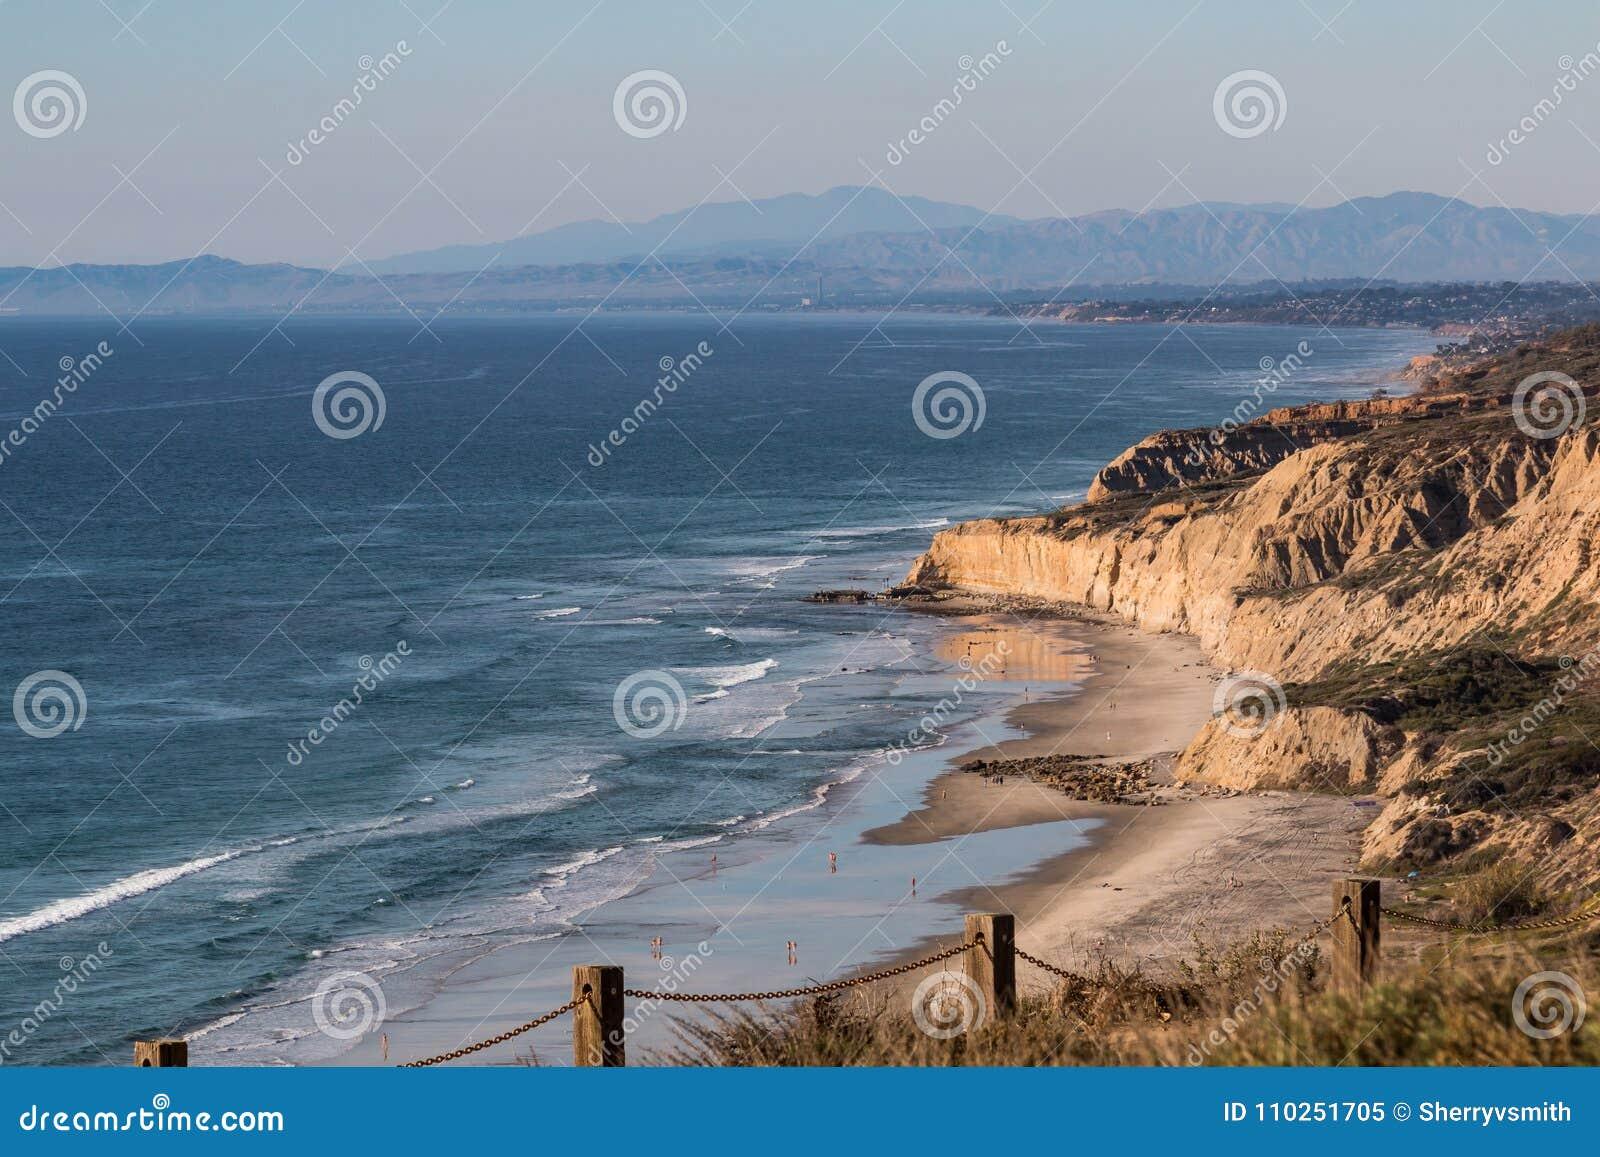 Black`s Beach In San Diego, California Stock Image - Image